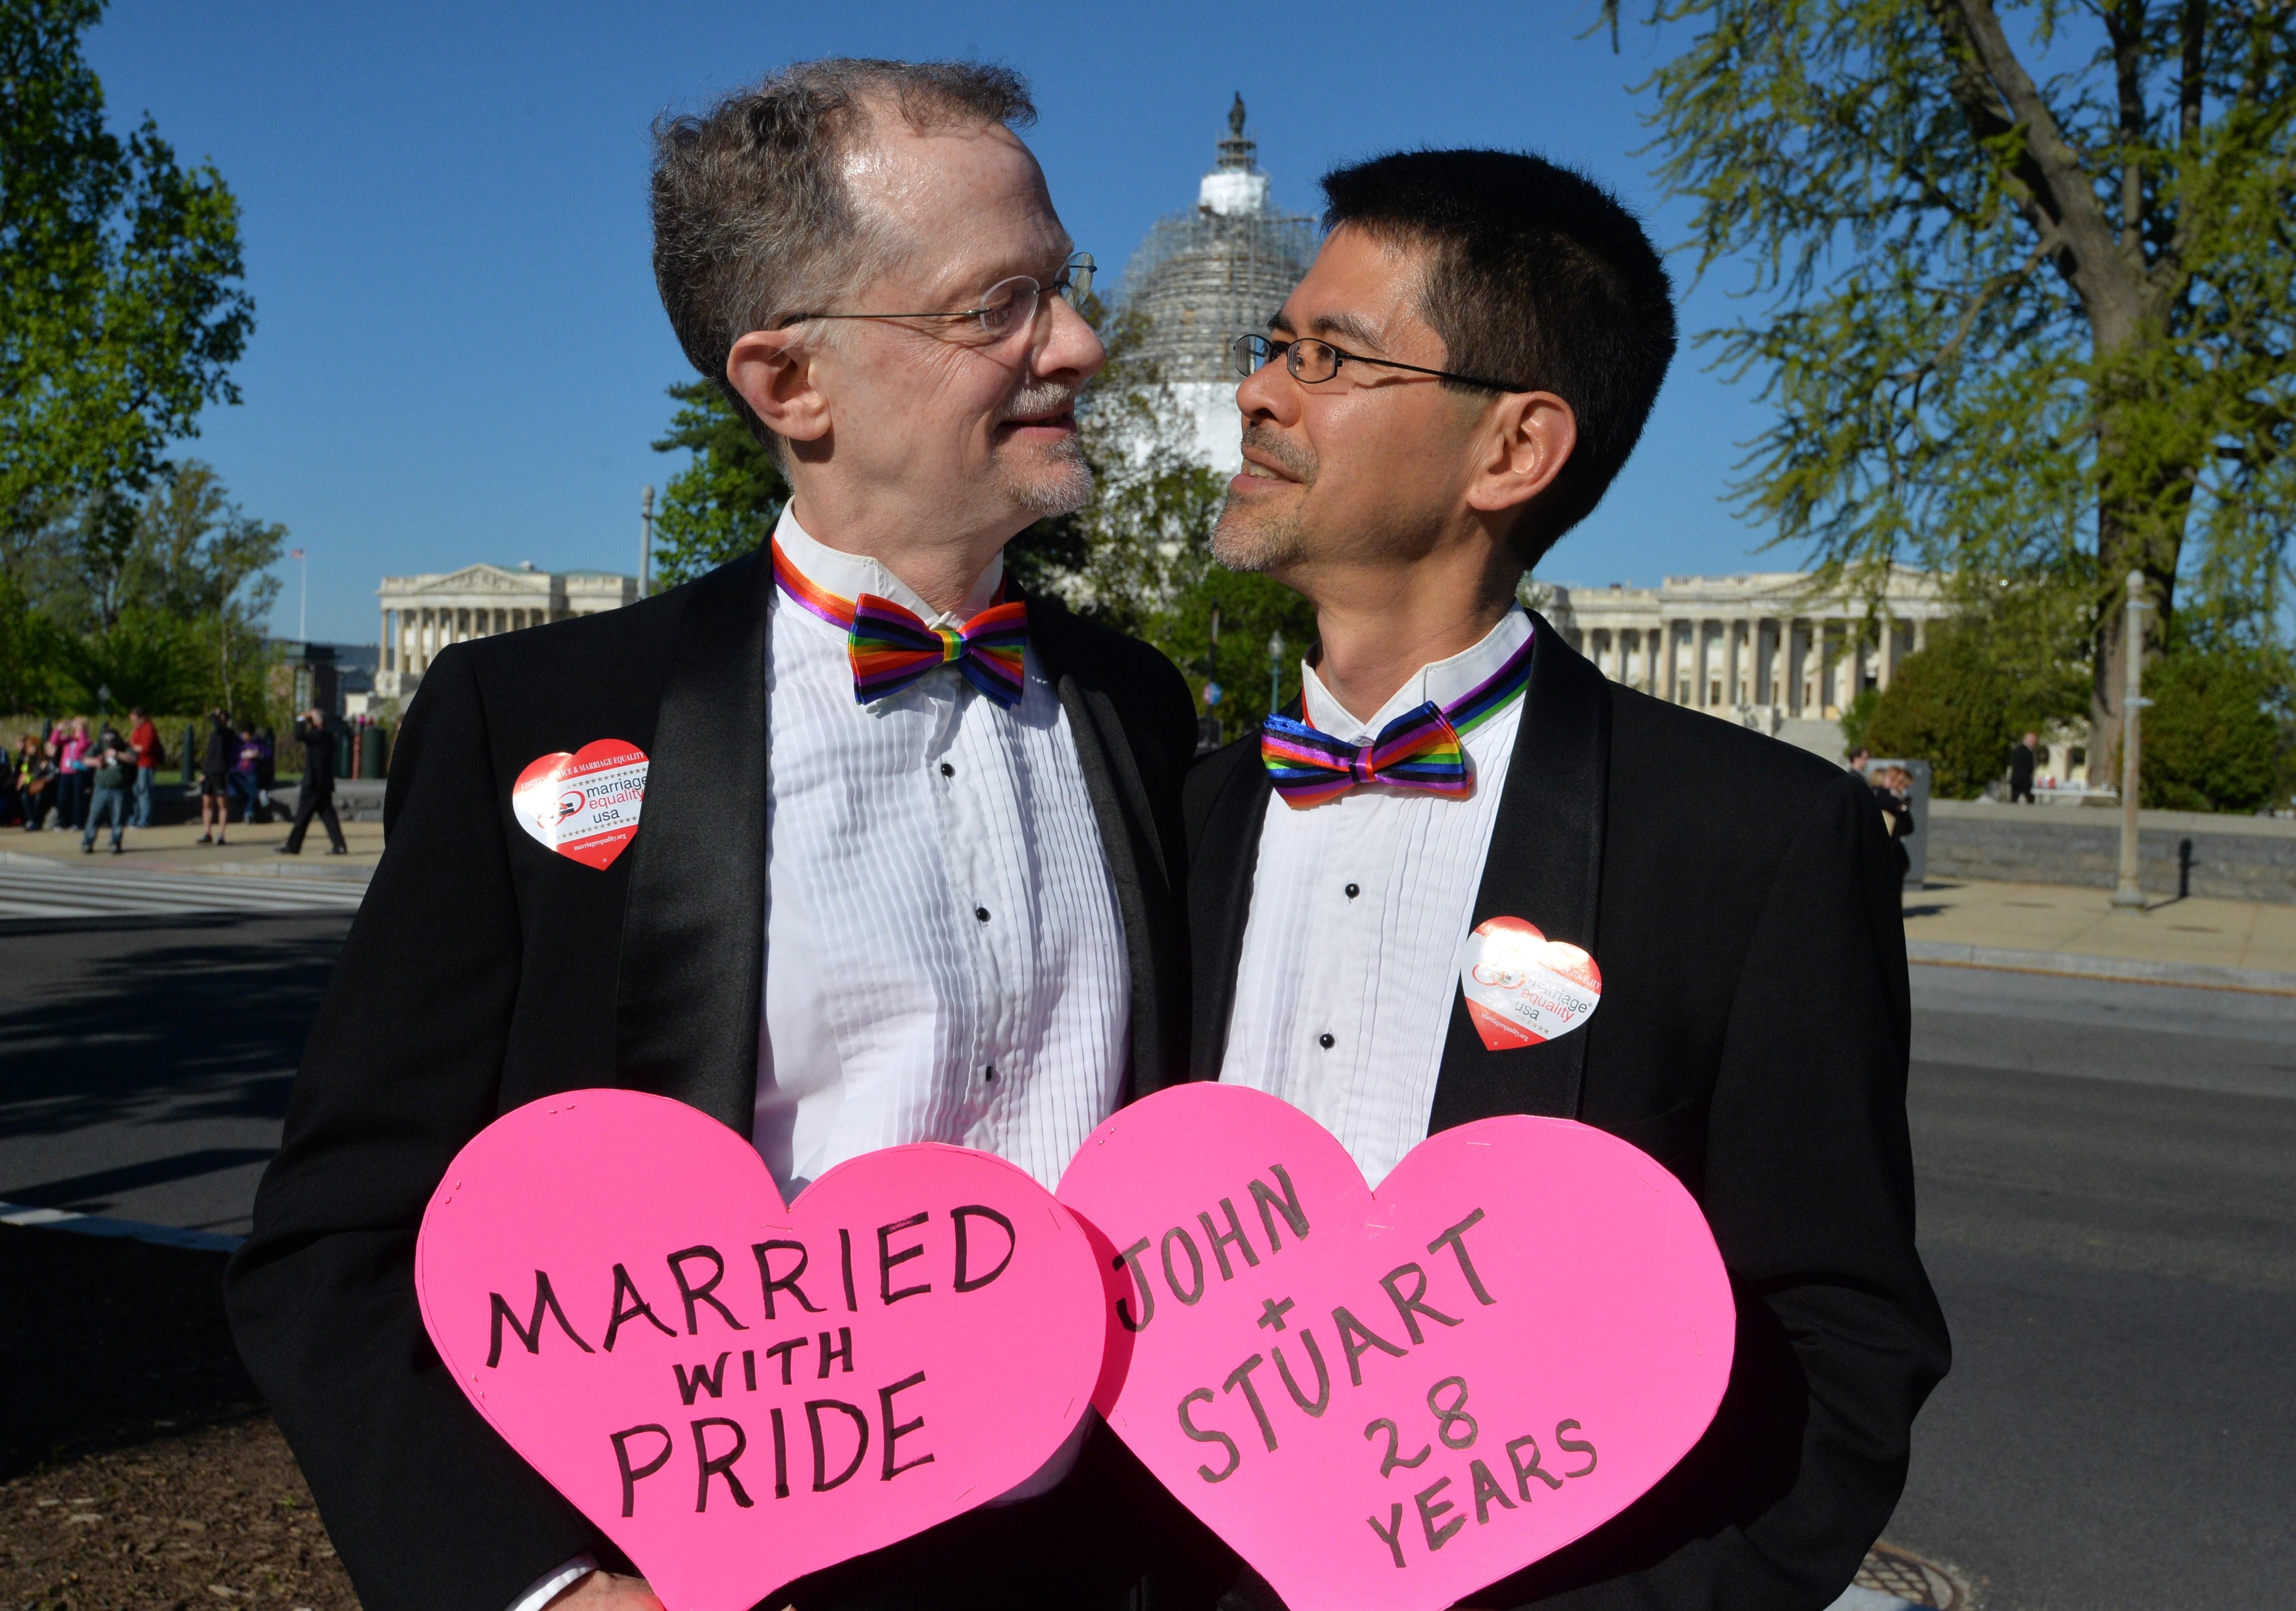 Difference between cisgender and heterosexual marriage